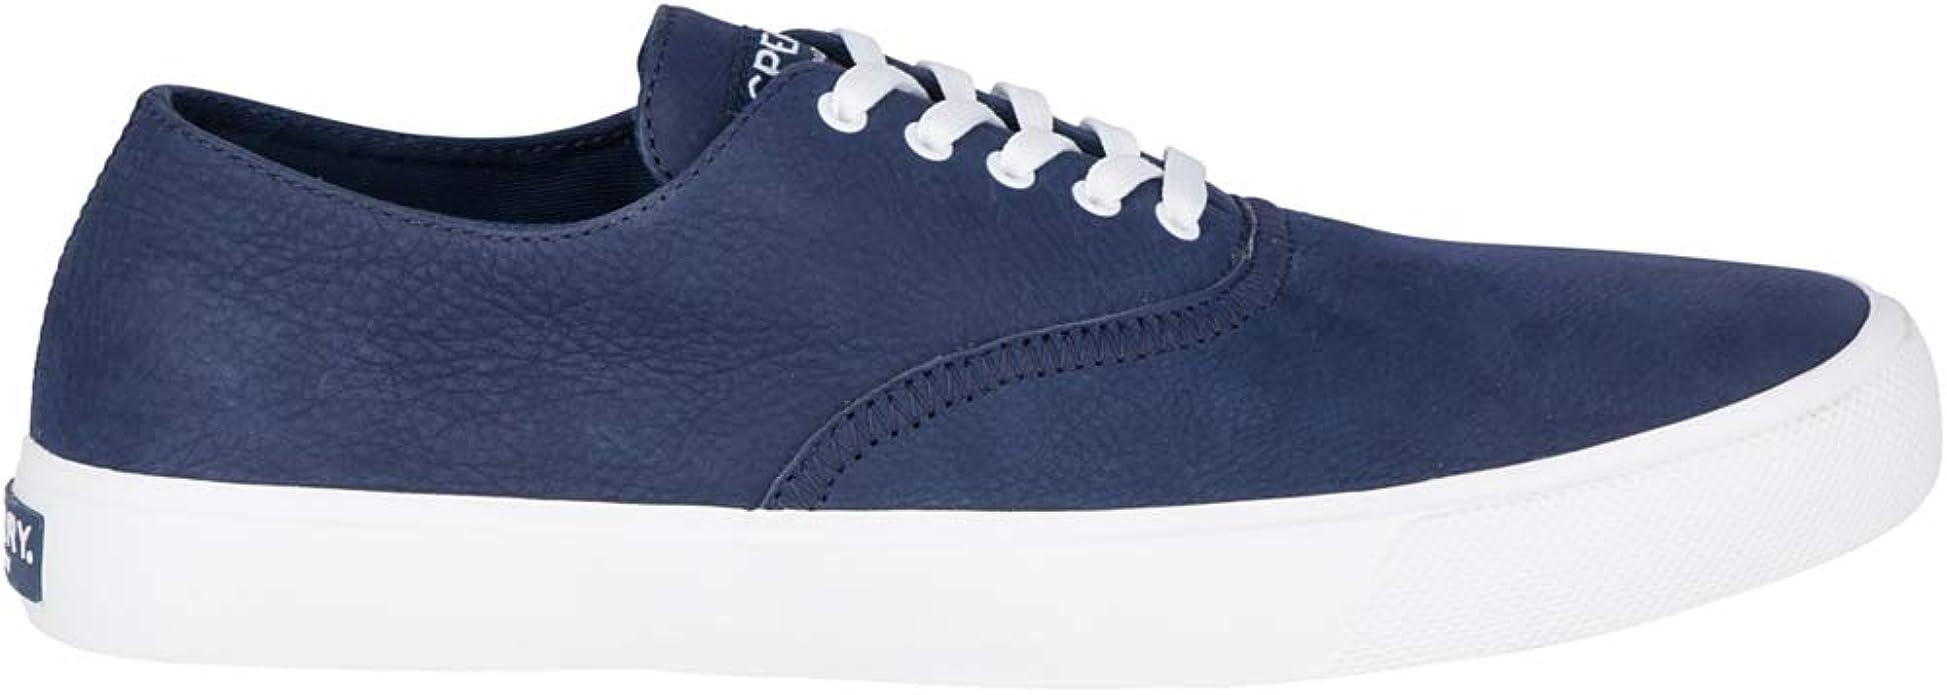 CVO Washable Sneaker, Navy